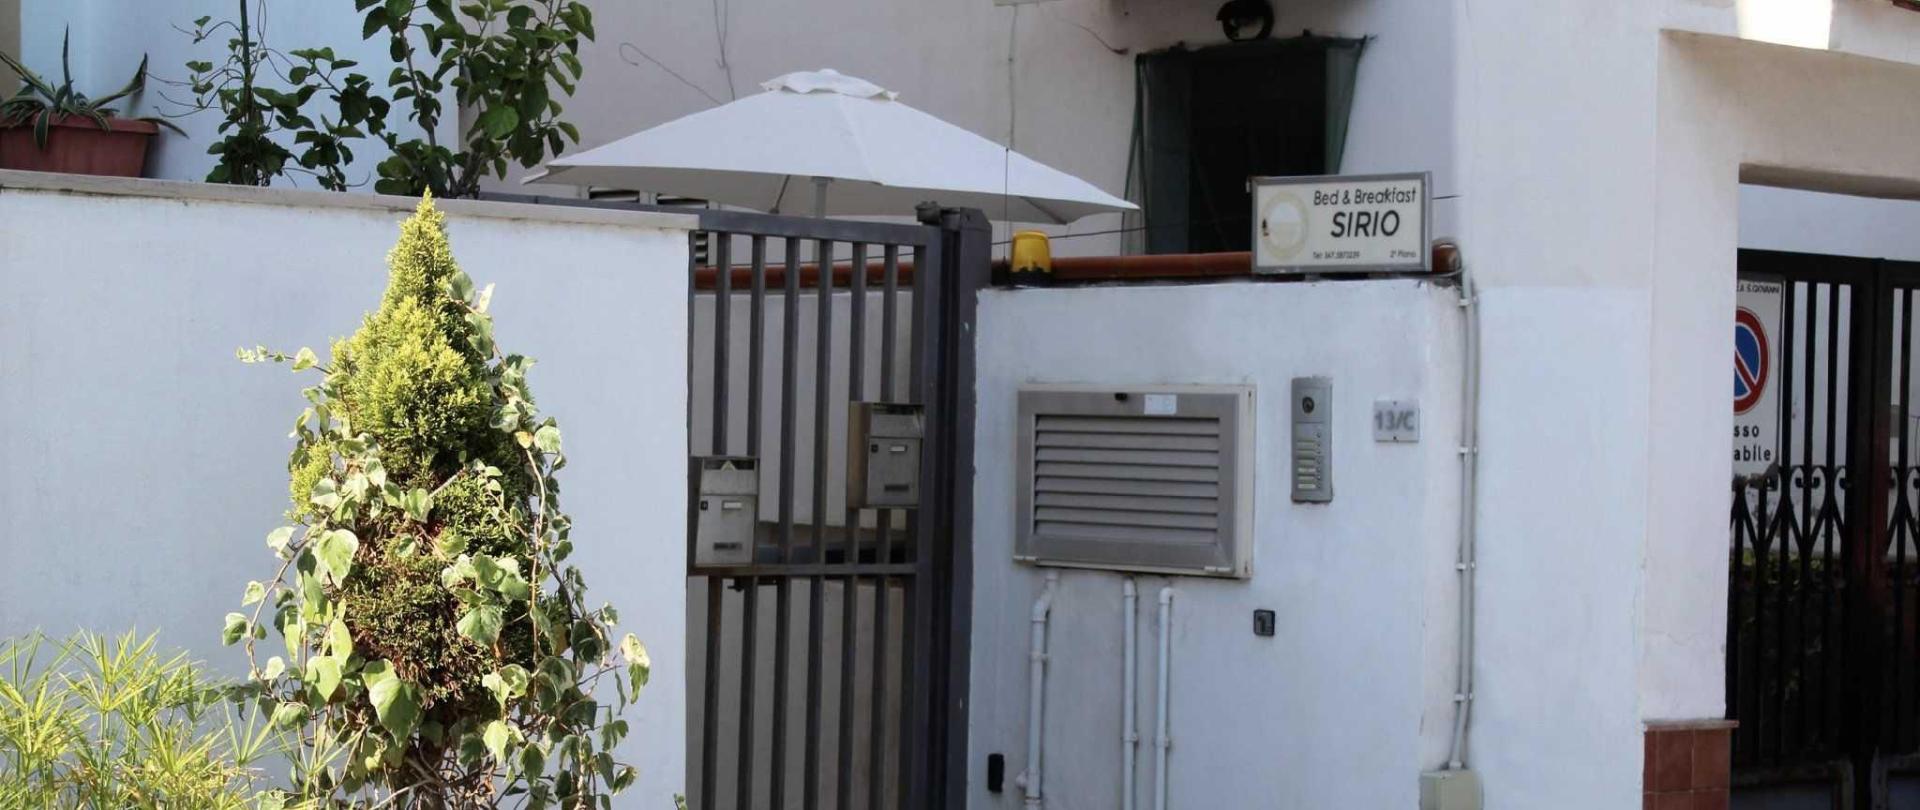 ingresso-via-pescatori-beb-sirio1.jpeg